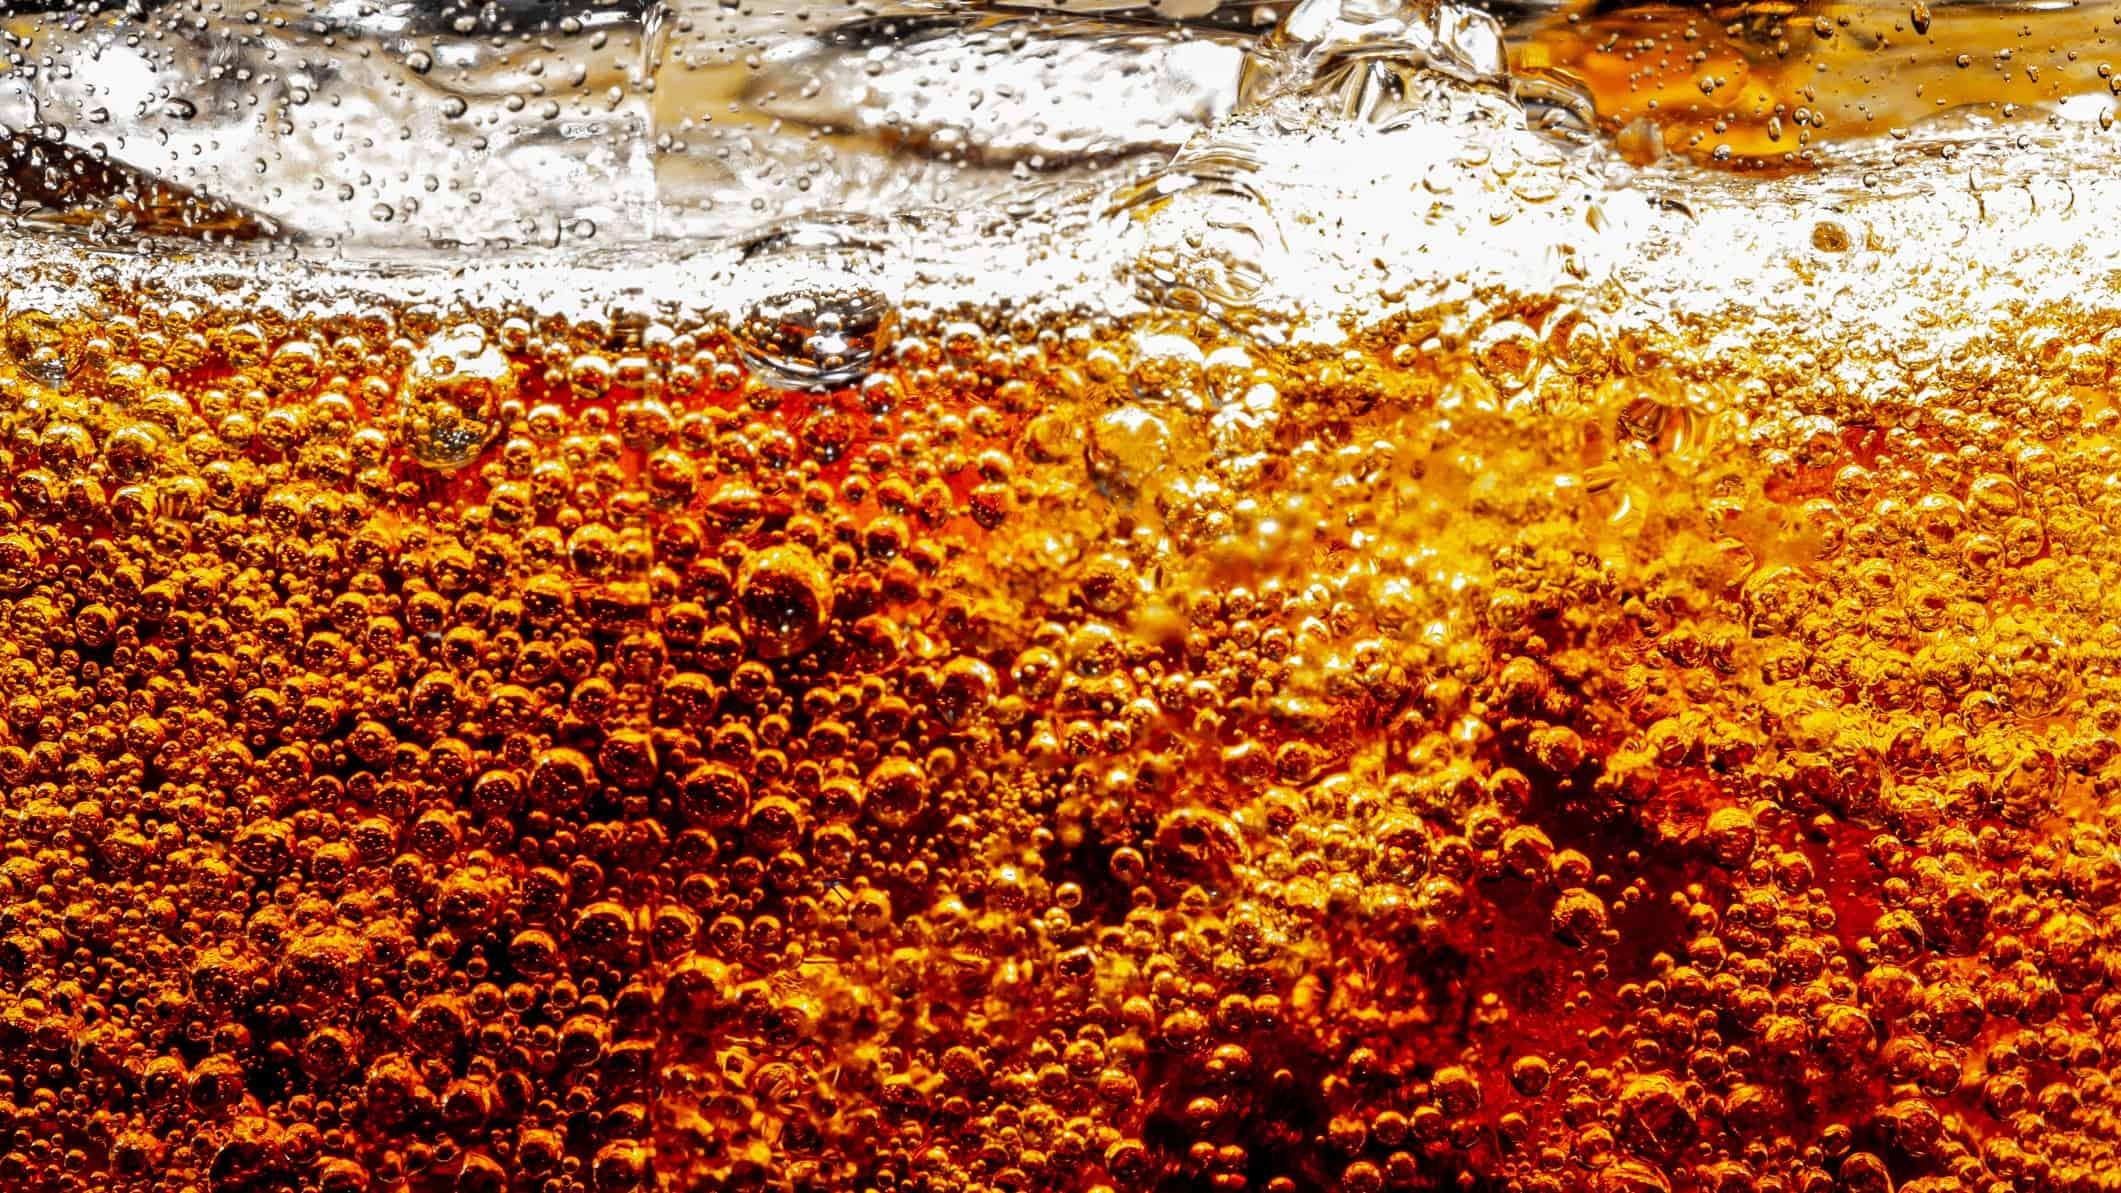 close up shot of glass of coca-cola